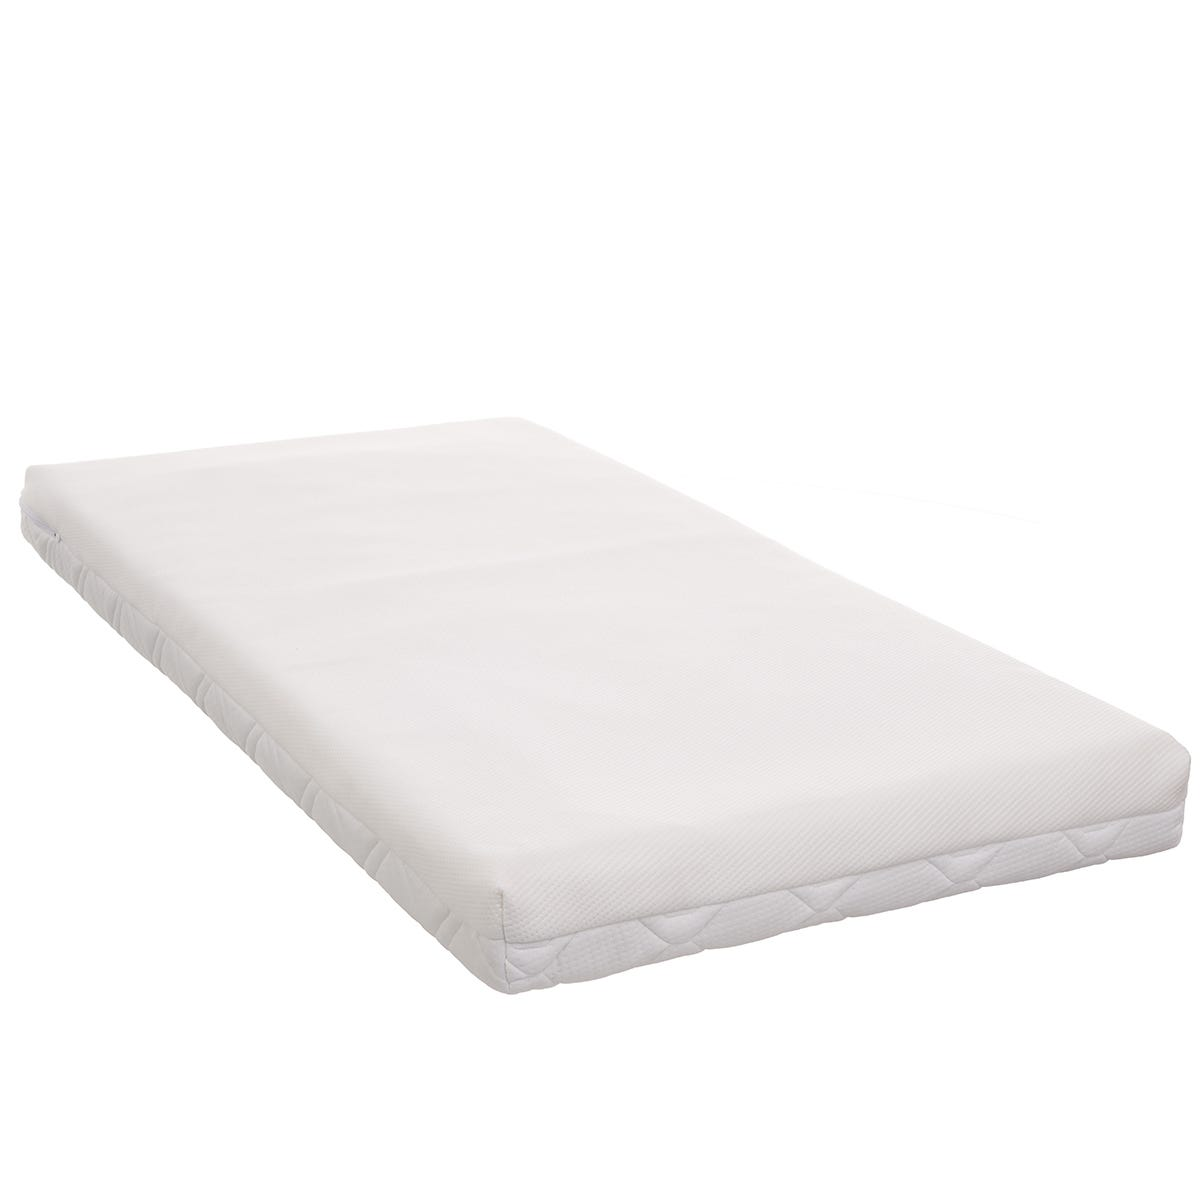 Obaby All Seasons 140 X 70 Pocket Sprung Cot Bed Mattress